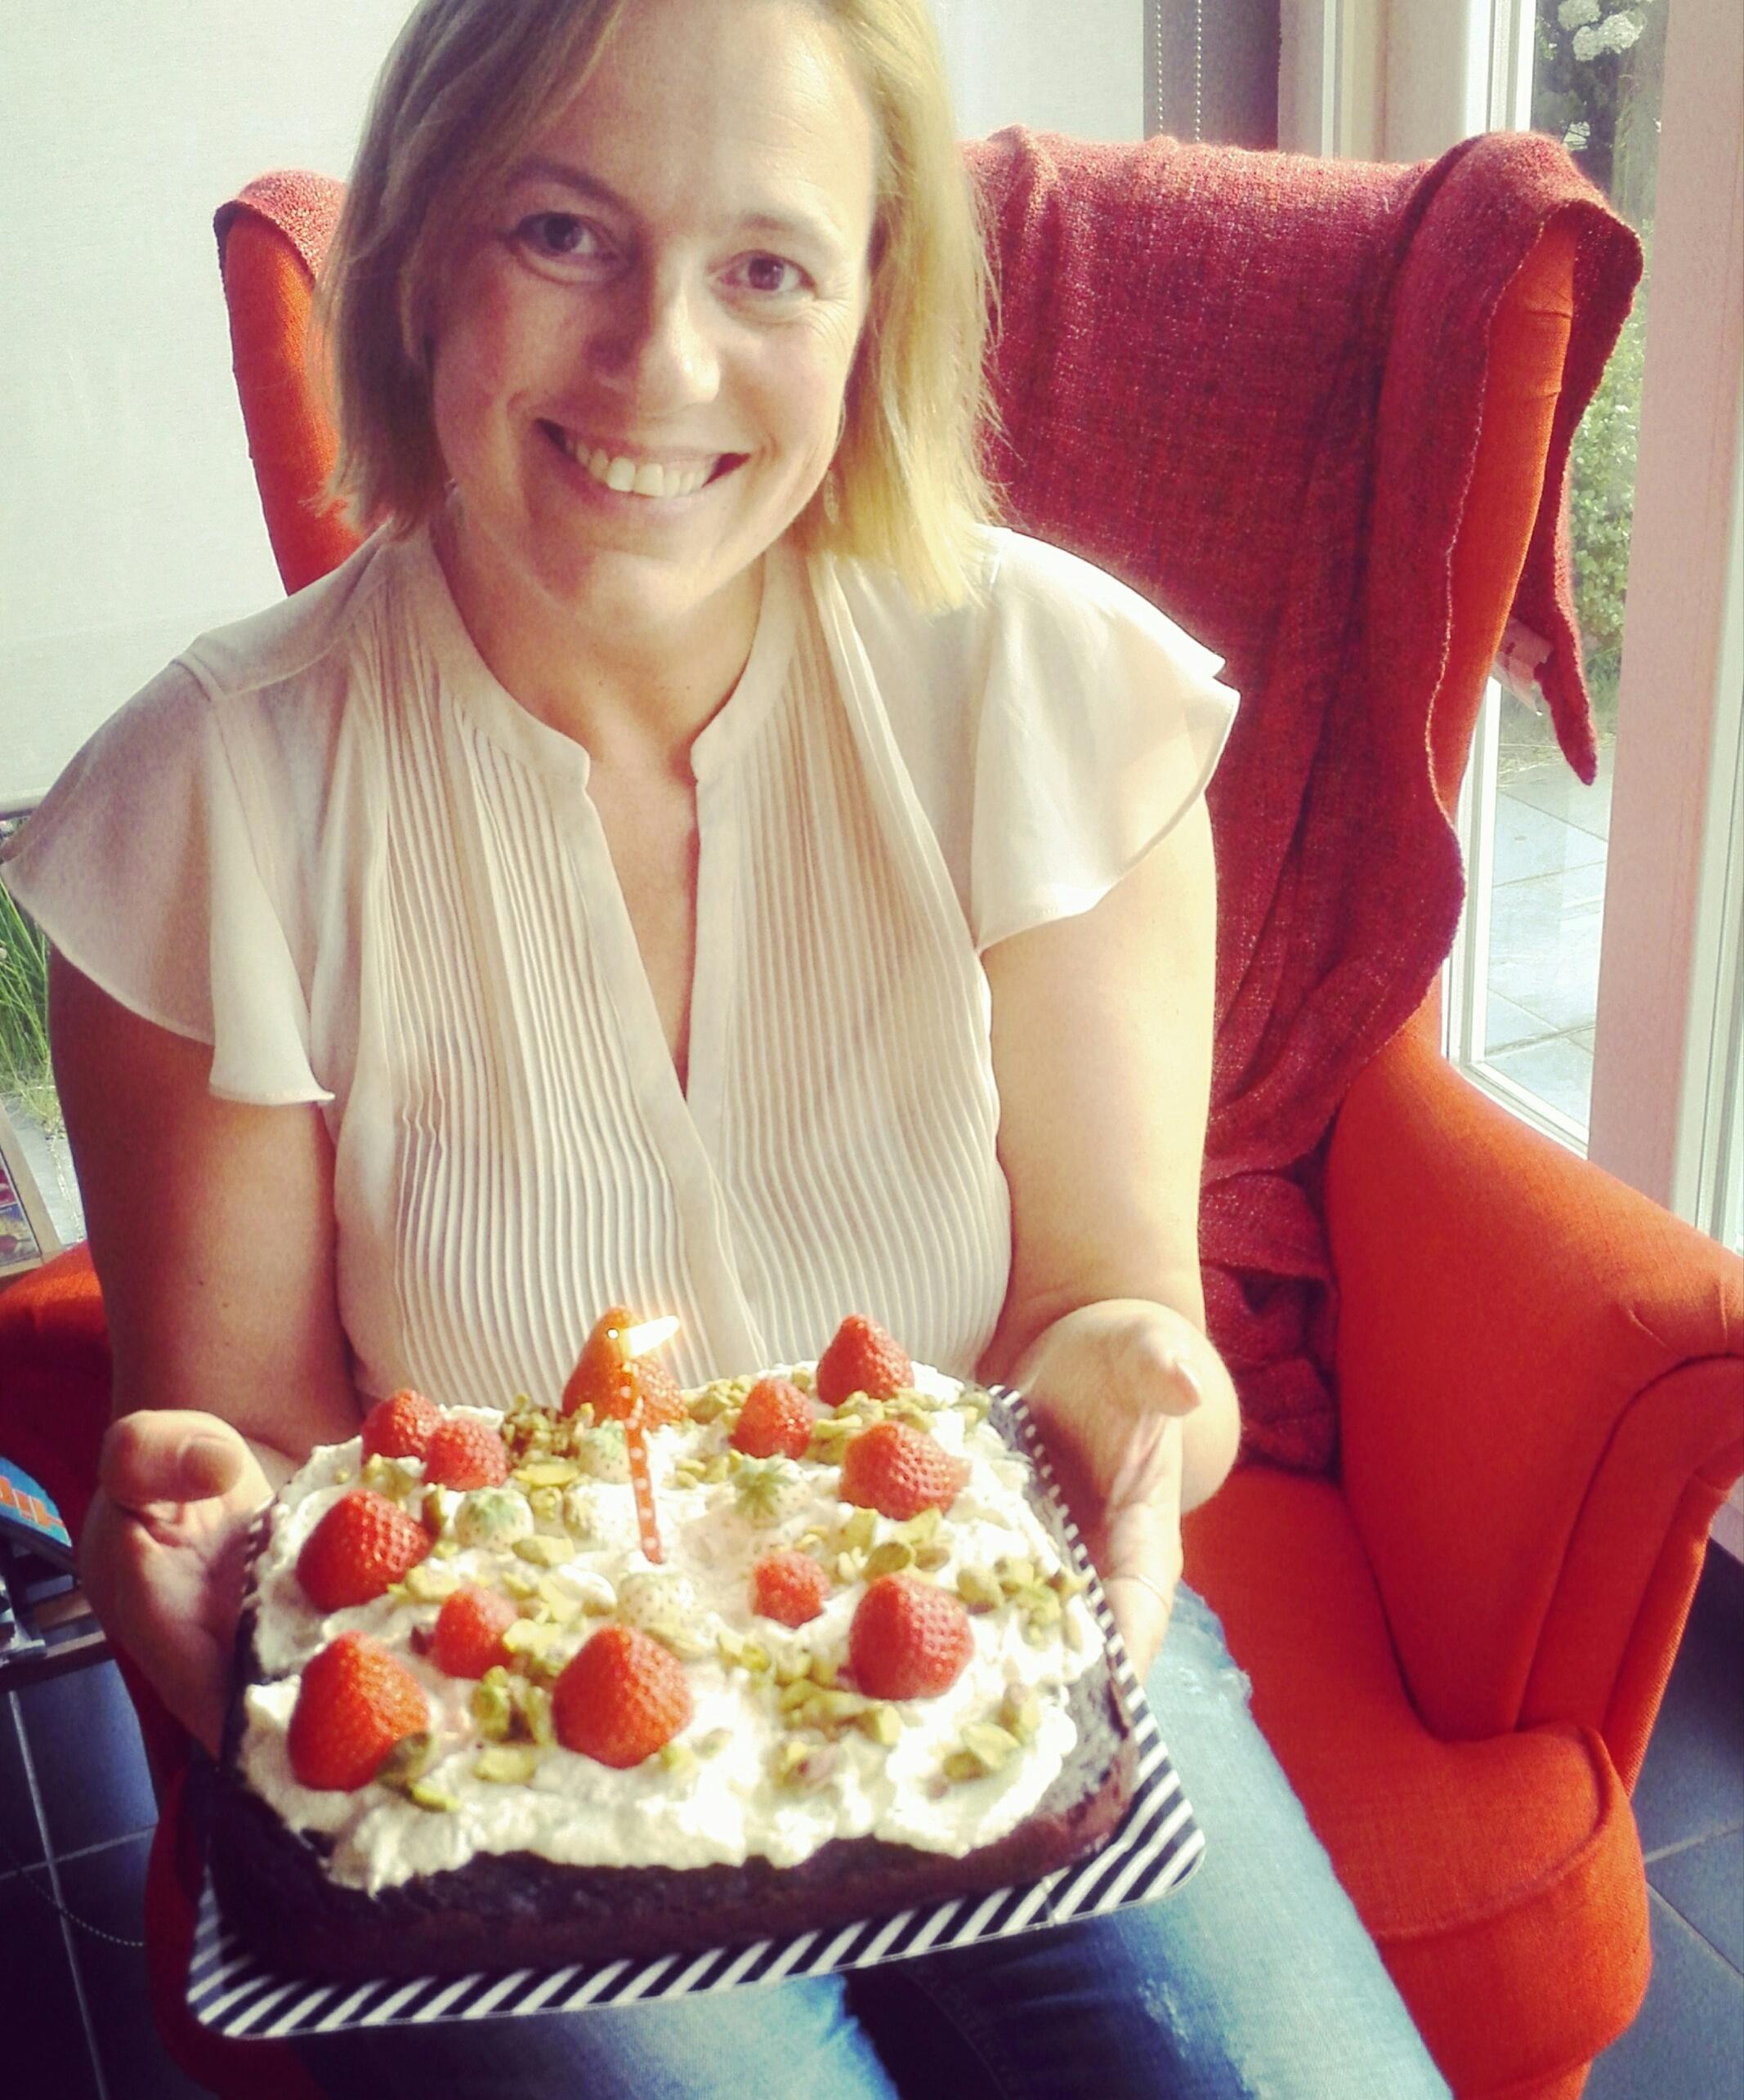 1 jaar feest en taart, ja, taart!